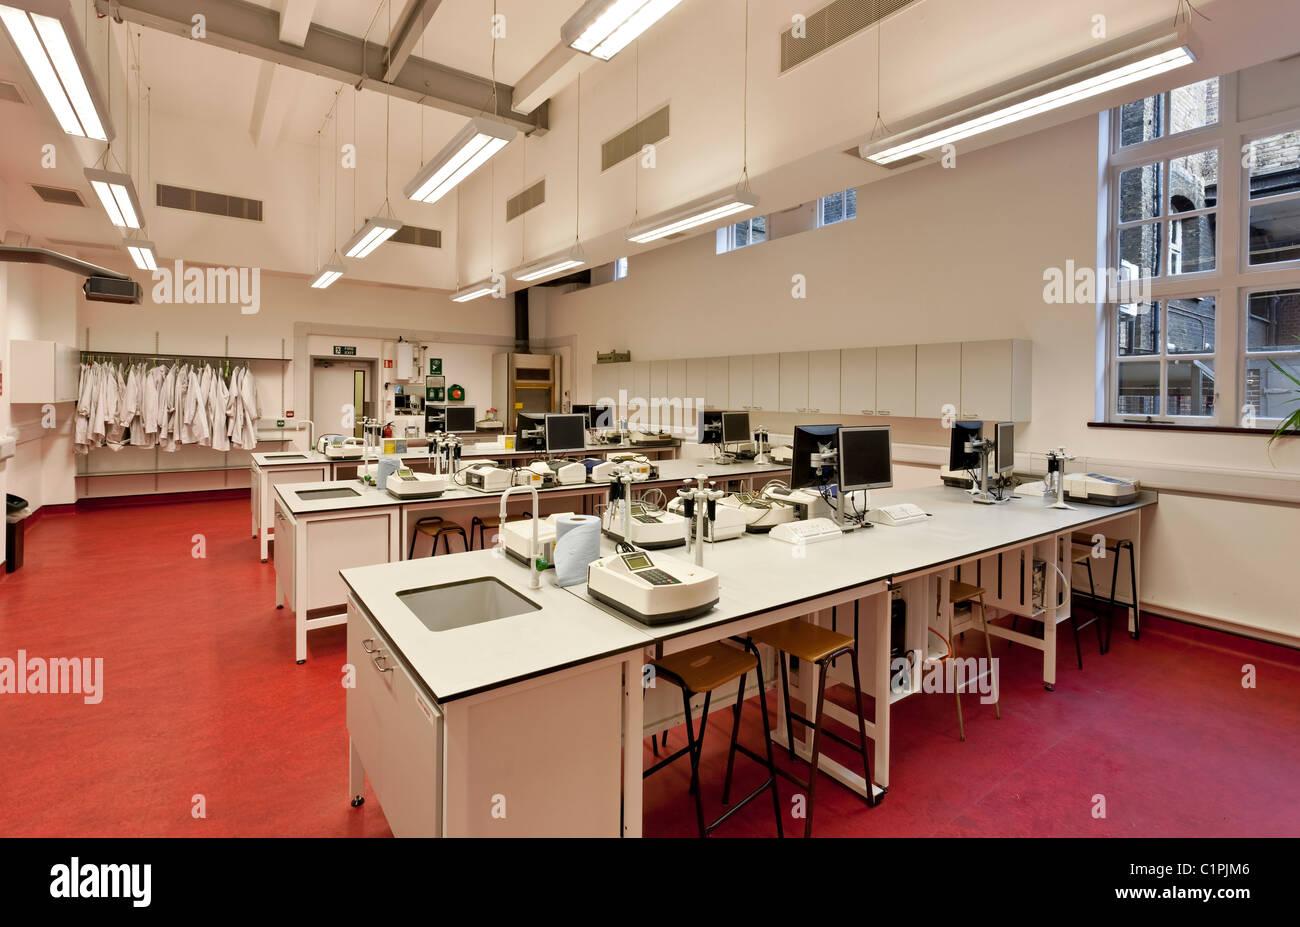 University of East London Stratford. - Stock Image